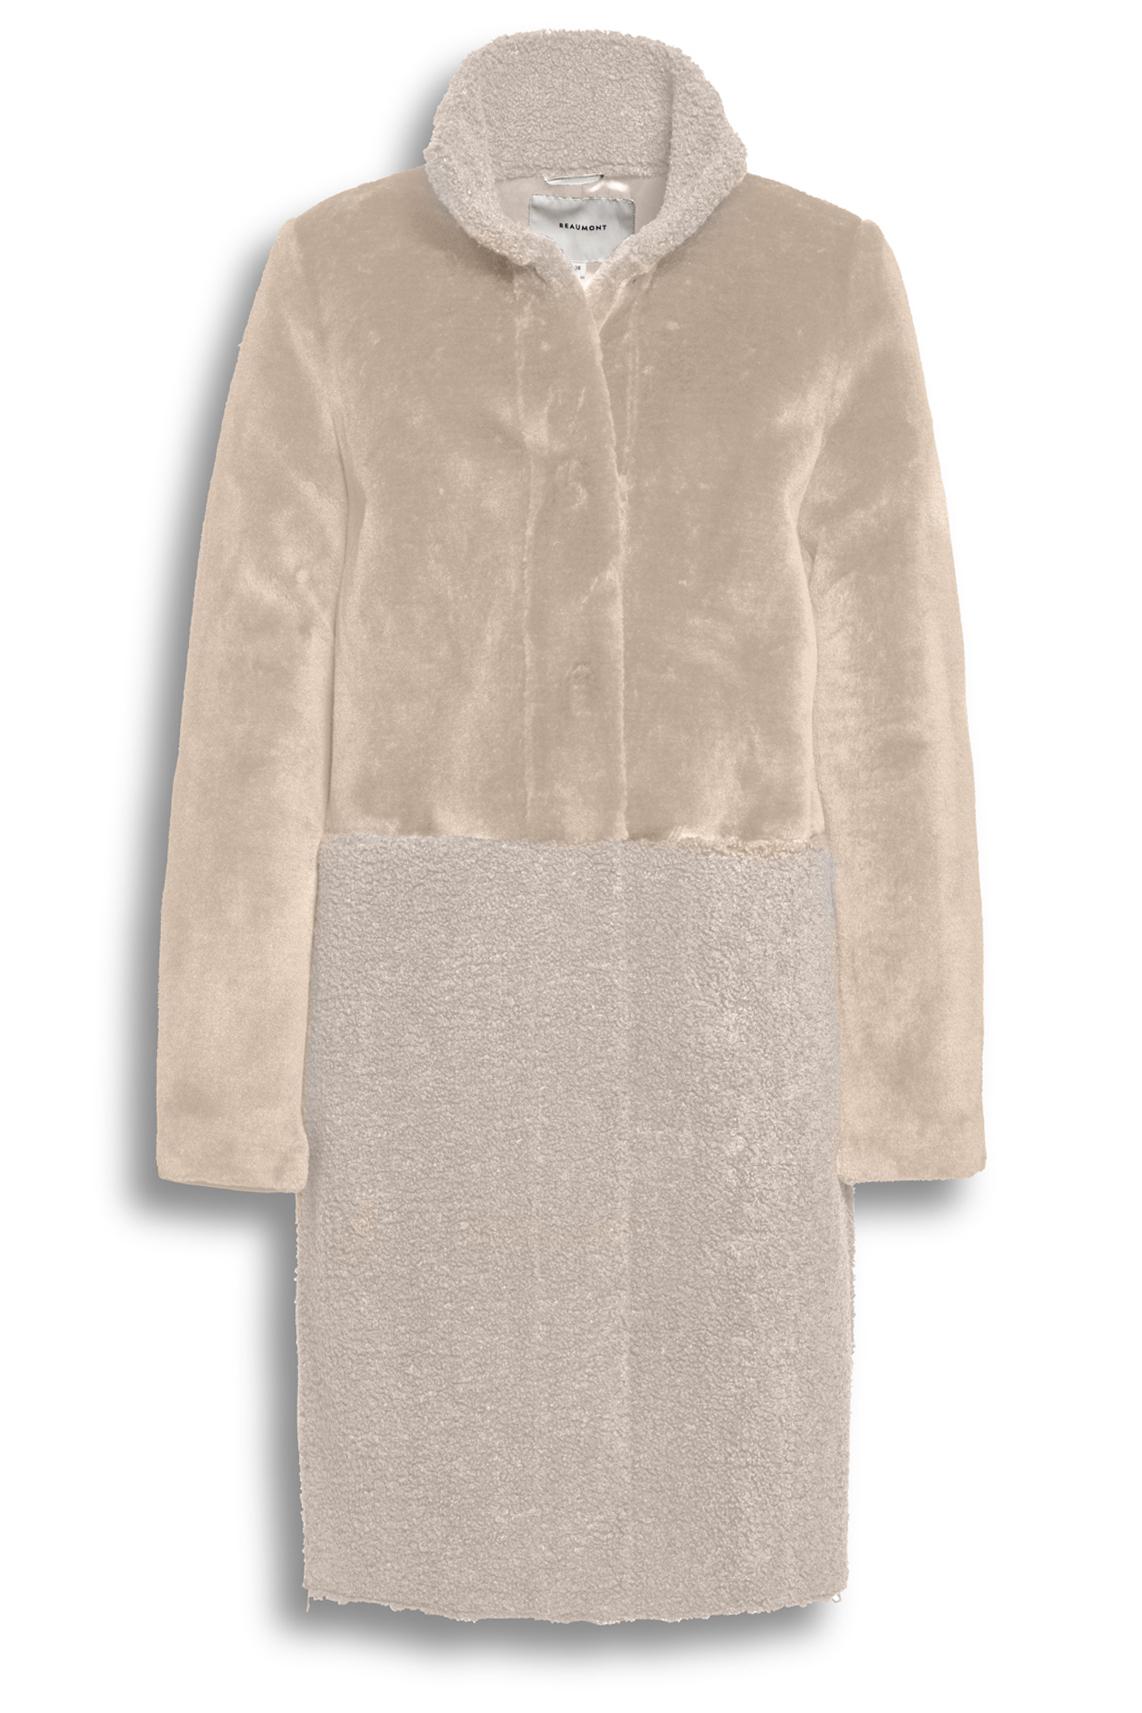 Beaumont Dames Materiaalmix mantel wit